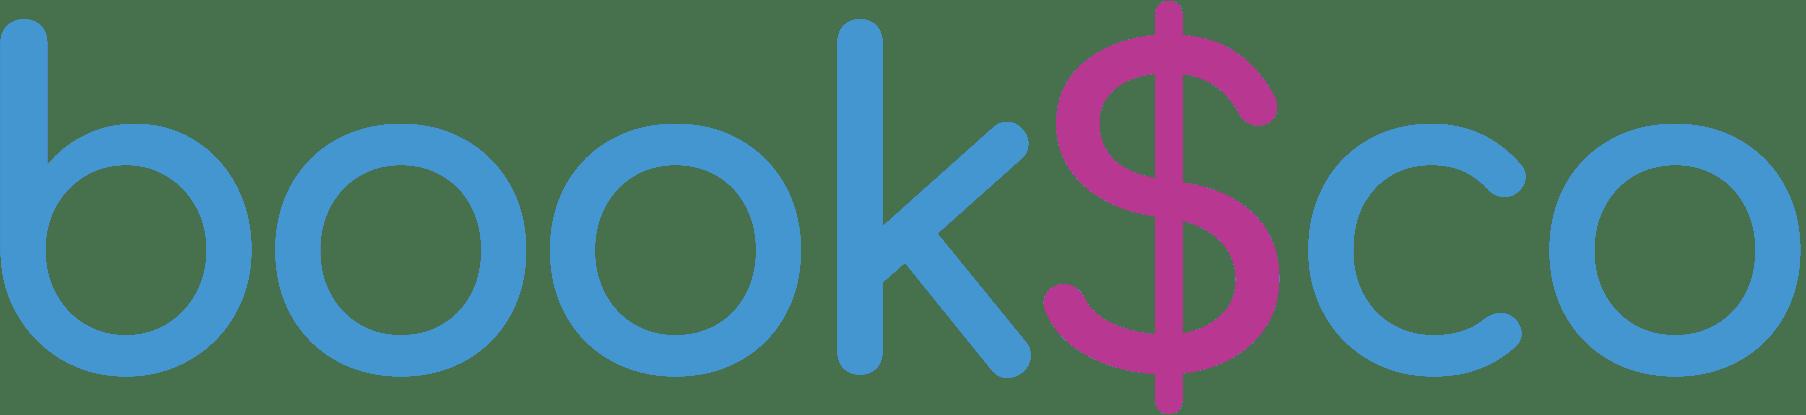 Book$co